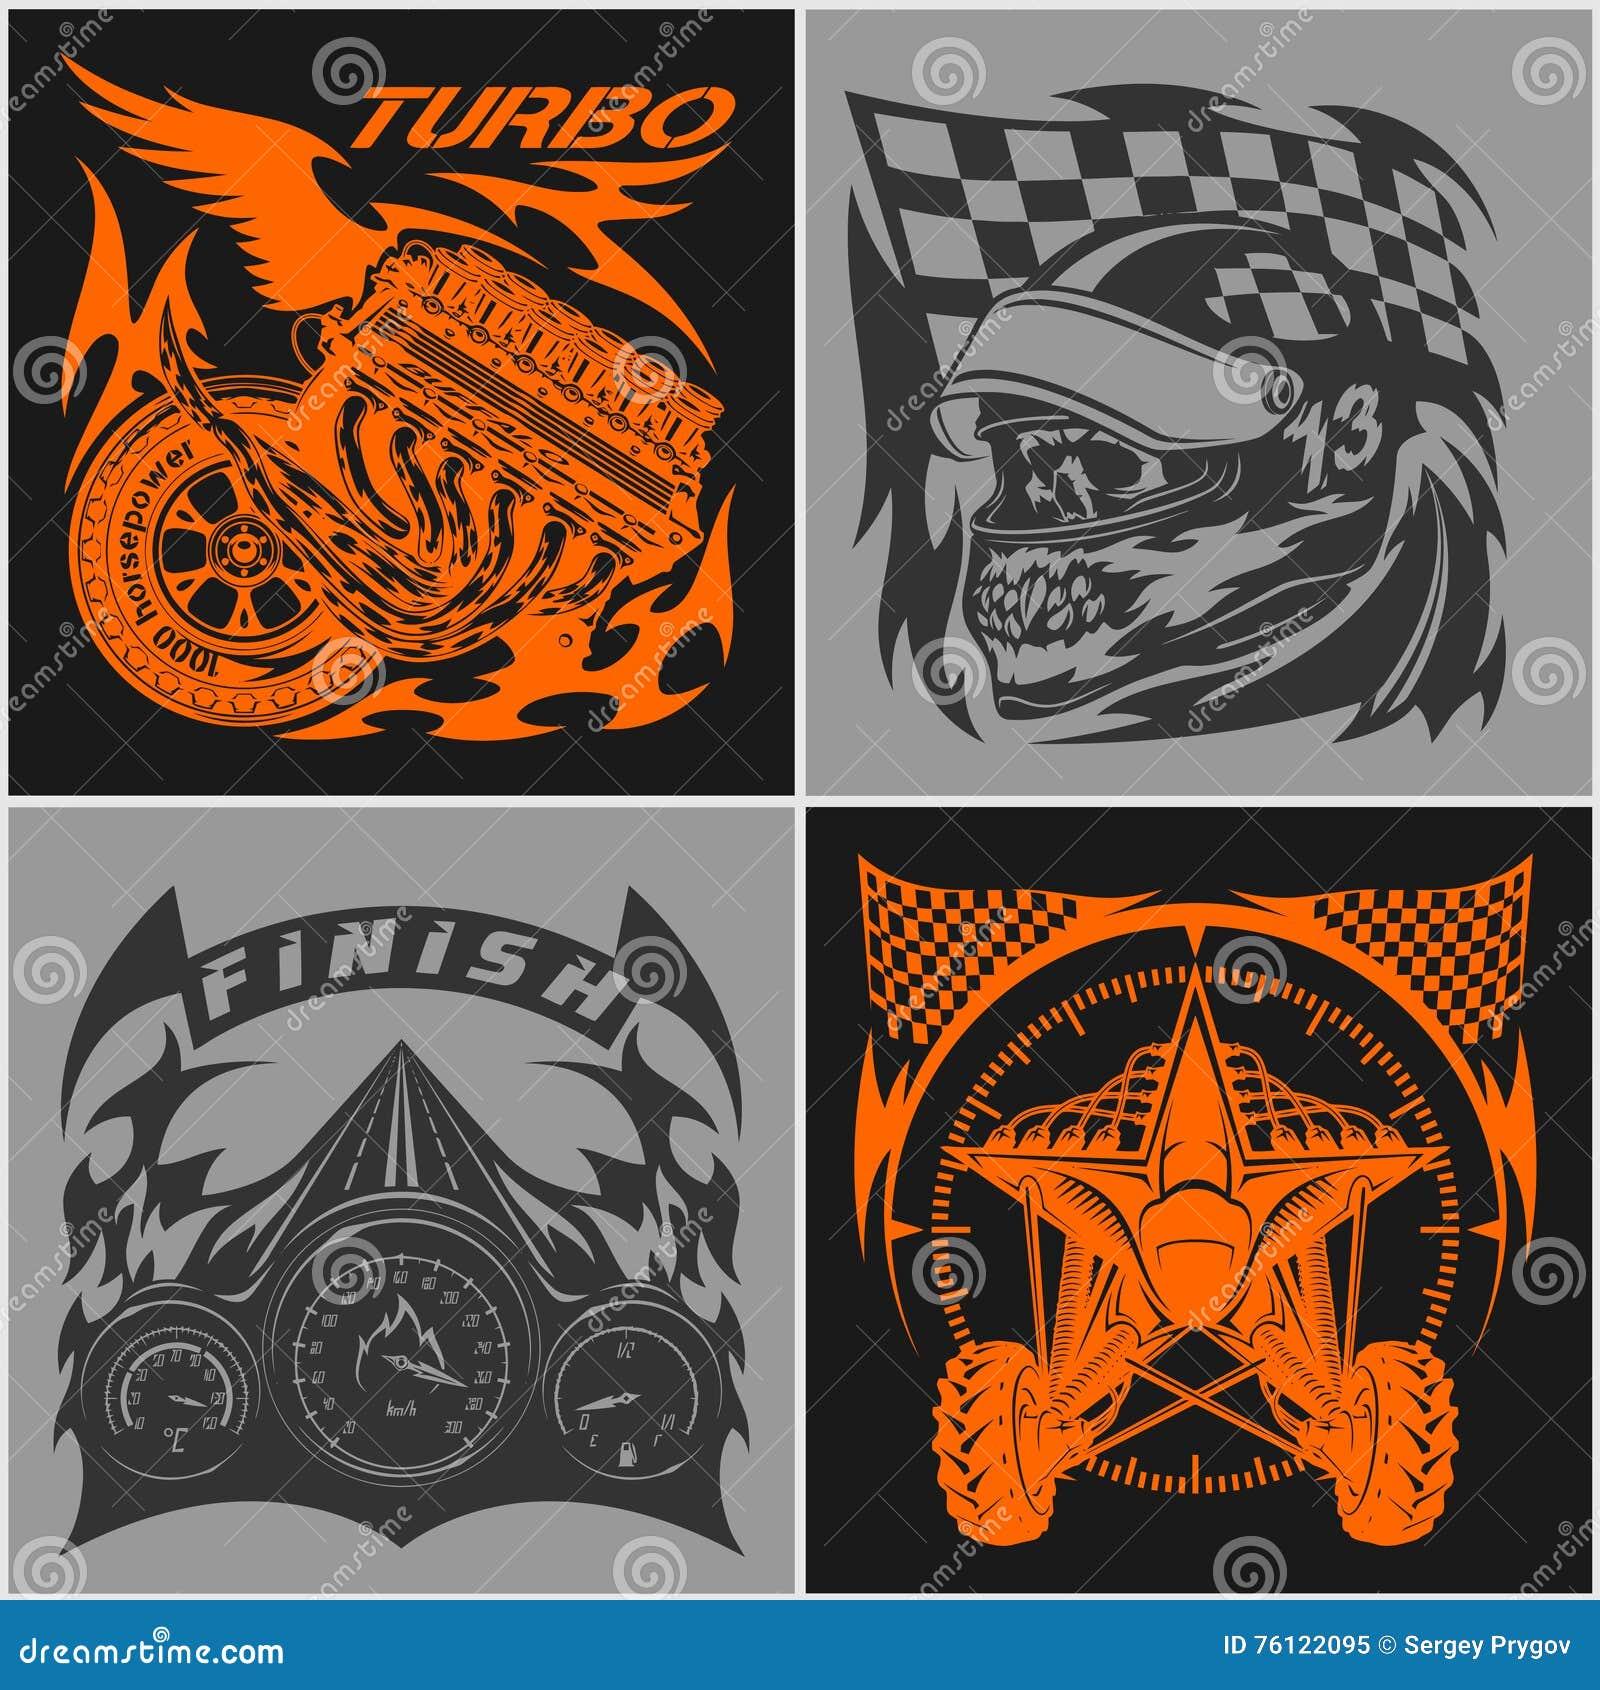 Auto Racing Emblems Sport Car Logo Illustration On Dark And Light